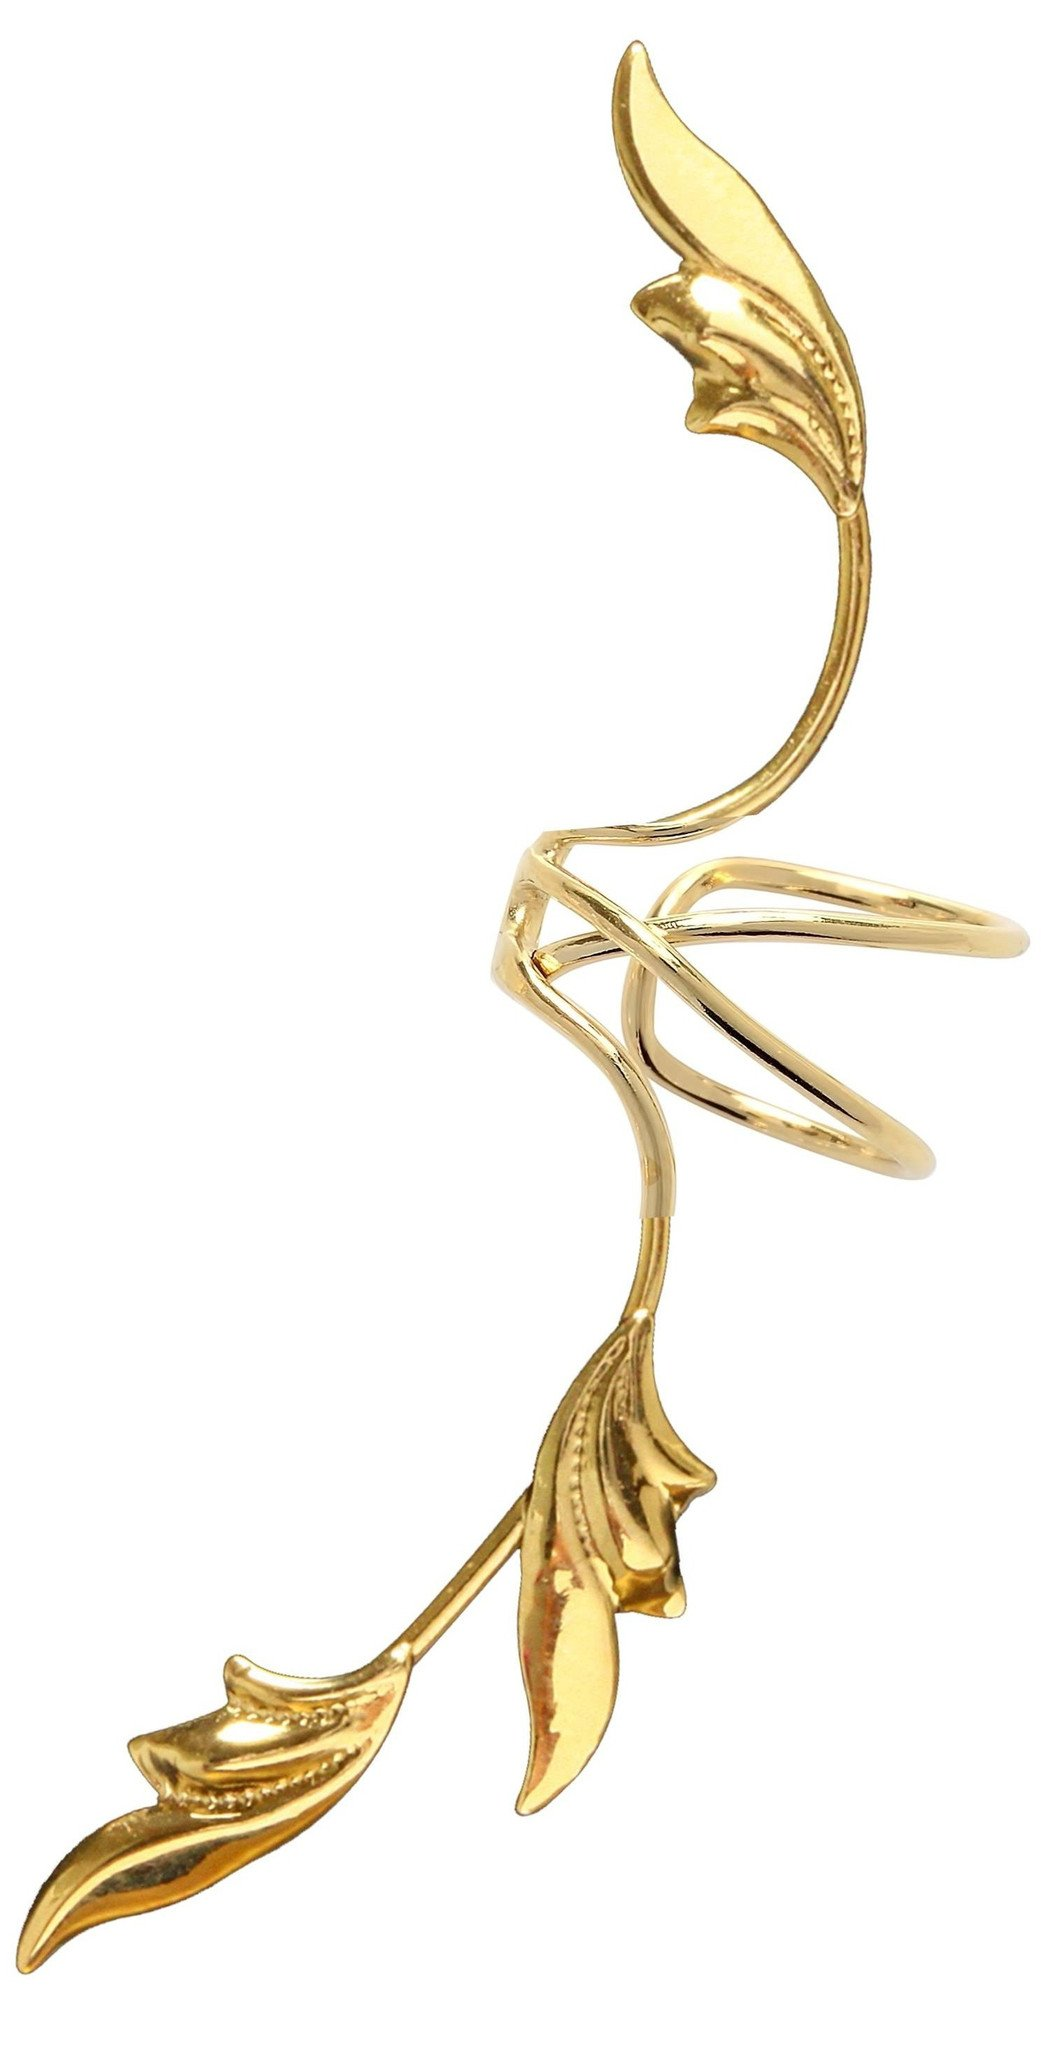 Delicate 3 Leaf Full Ear Spray Ear Cuff Non-pierced Cartilage Wrap Earring Single Left in Gold over Sterling Silver